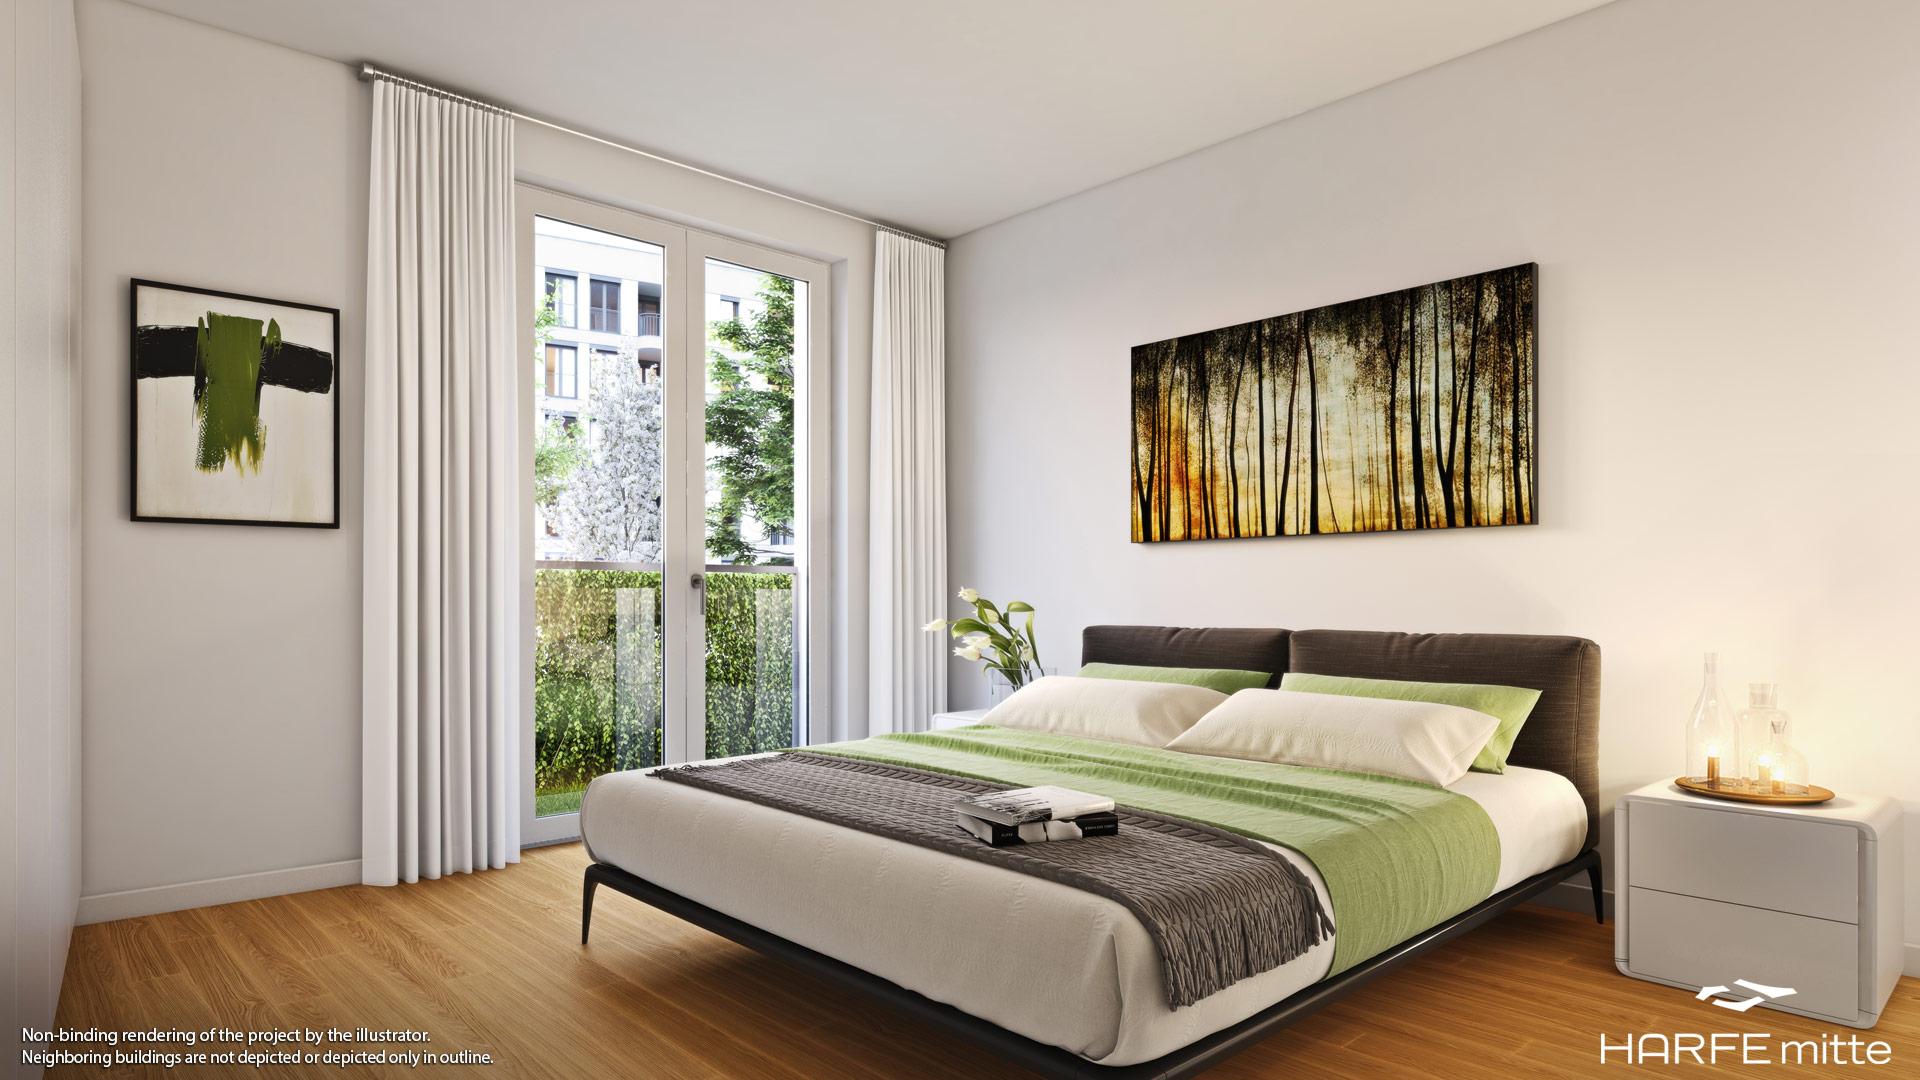 Property HARFE mitte - example illustration bedroom